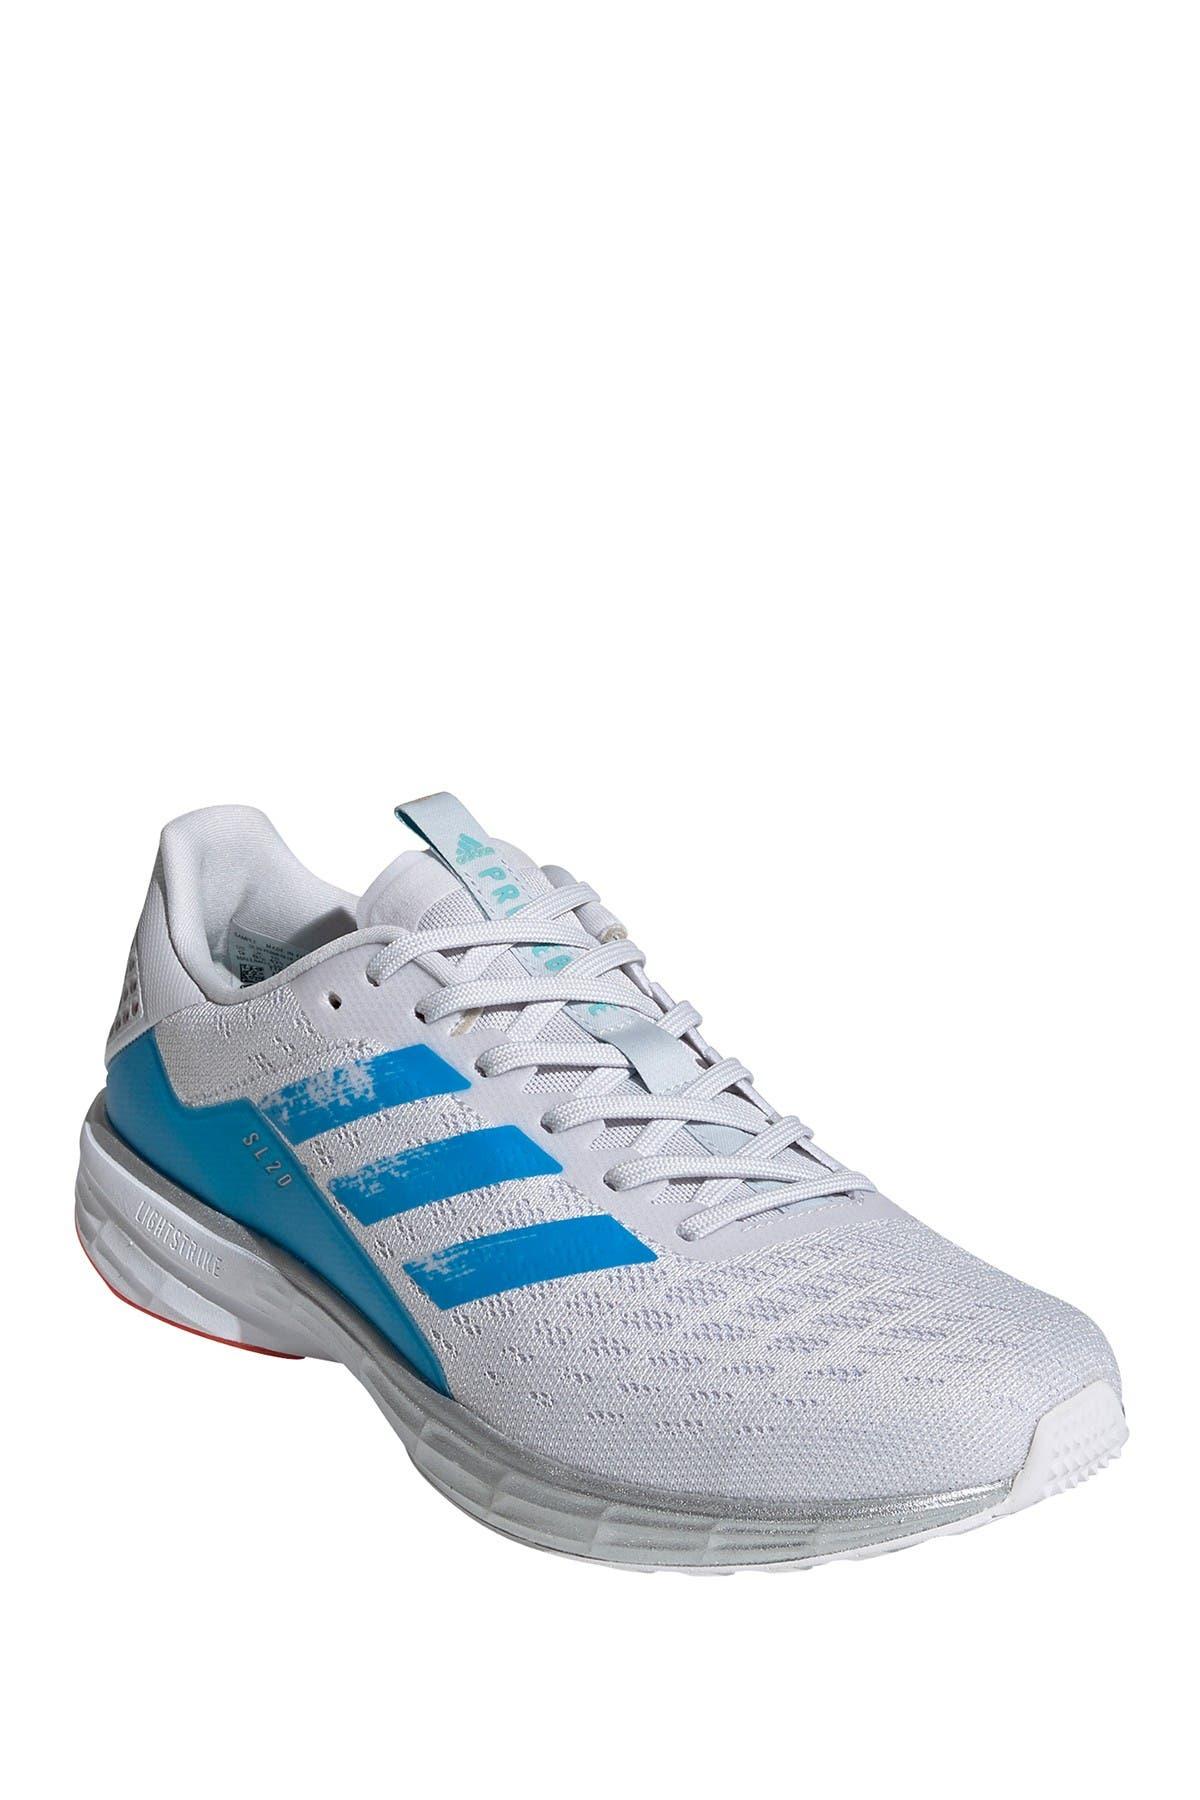 Image of adidas SL20 Primeblue Running Shoe